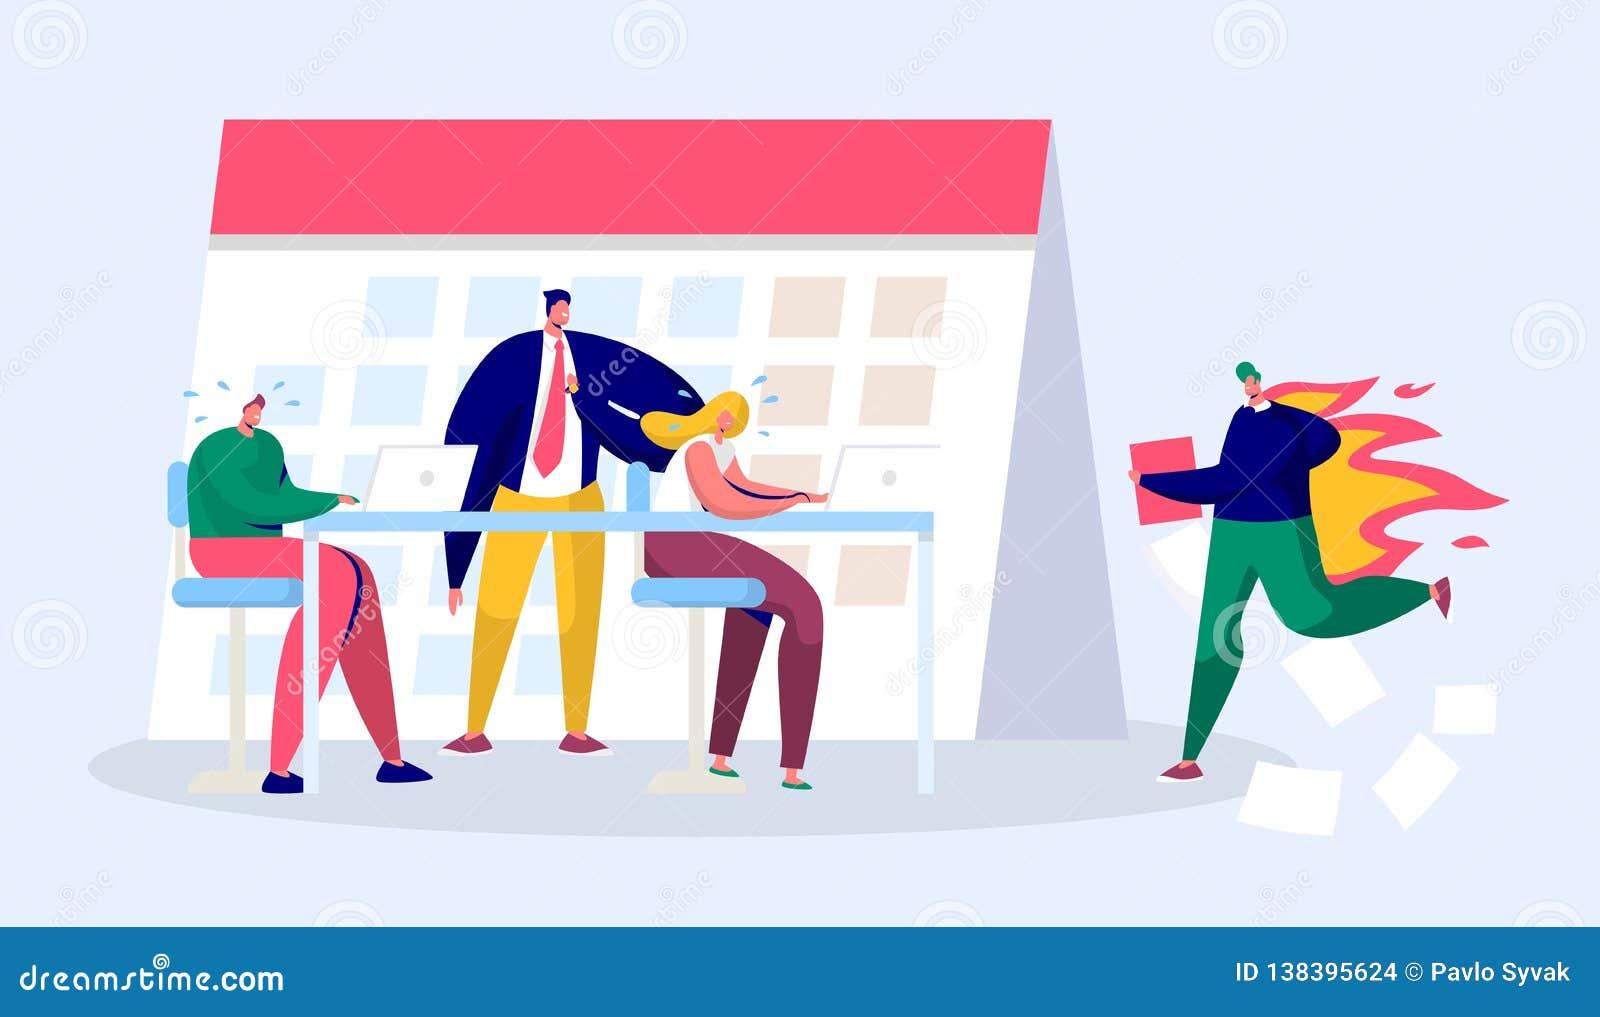 Büro-Geschäftsführer Person Work Overtime an der Frist Druck-Charakter-kompletter Bericht unter hartem Chef Pressure